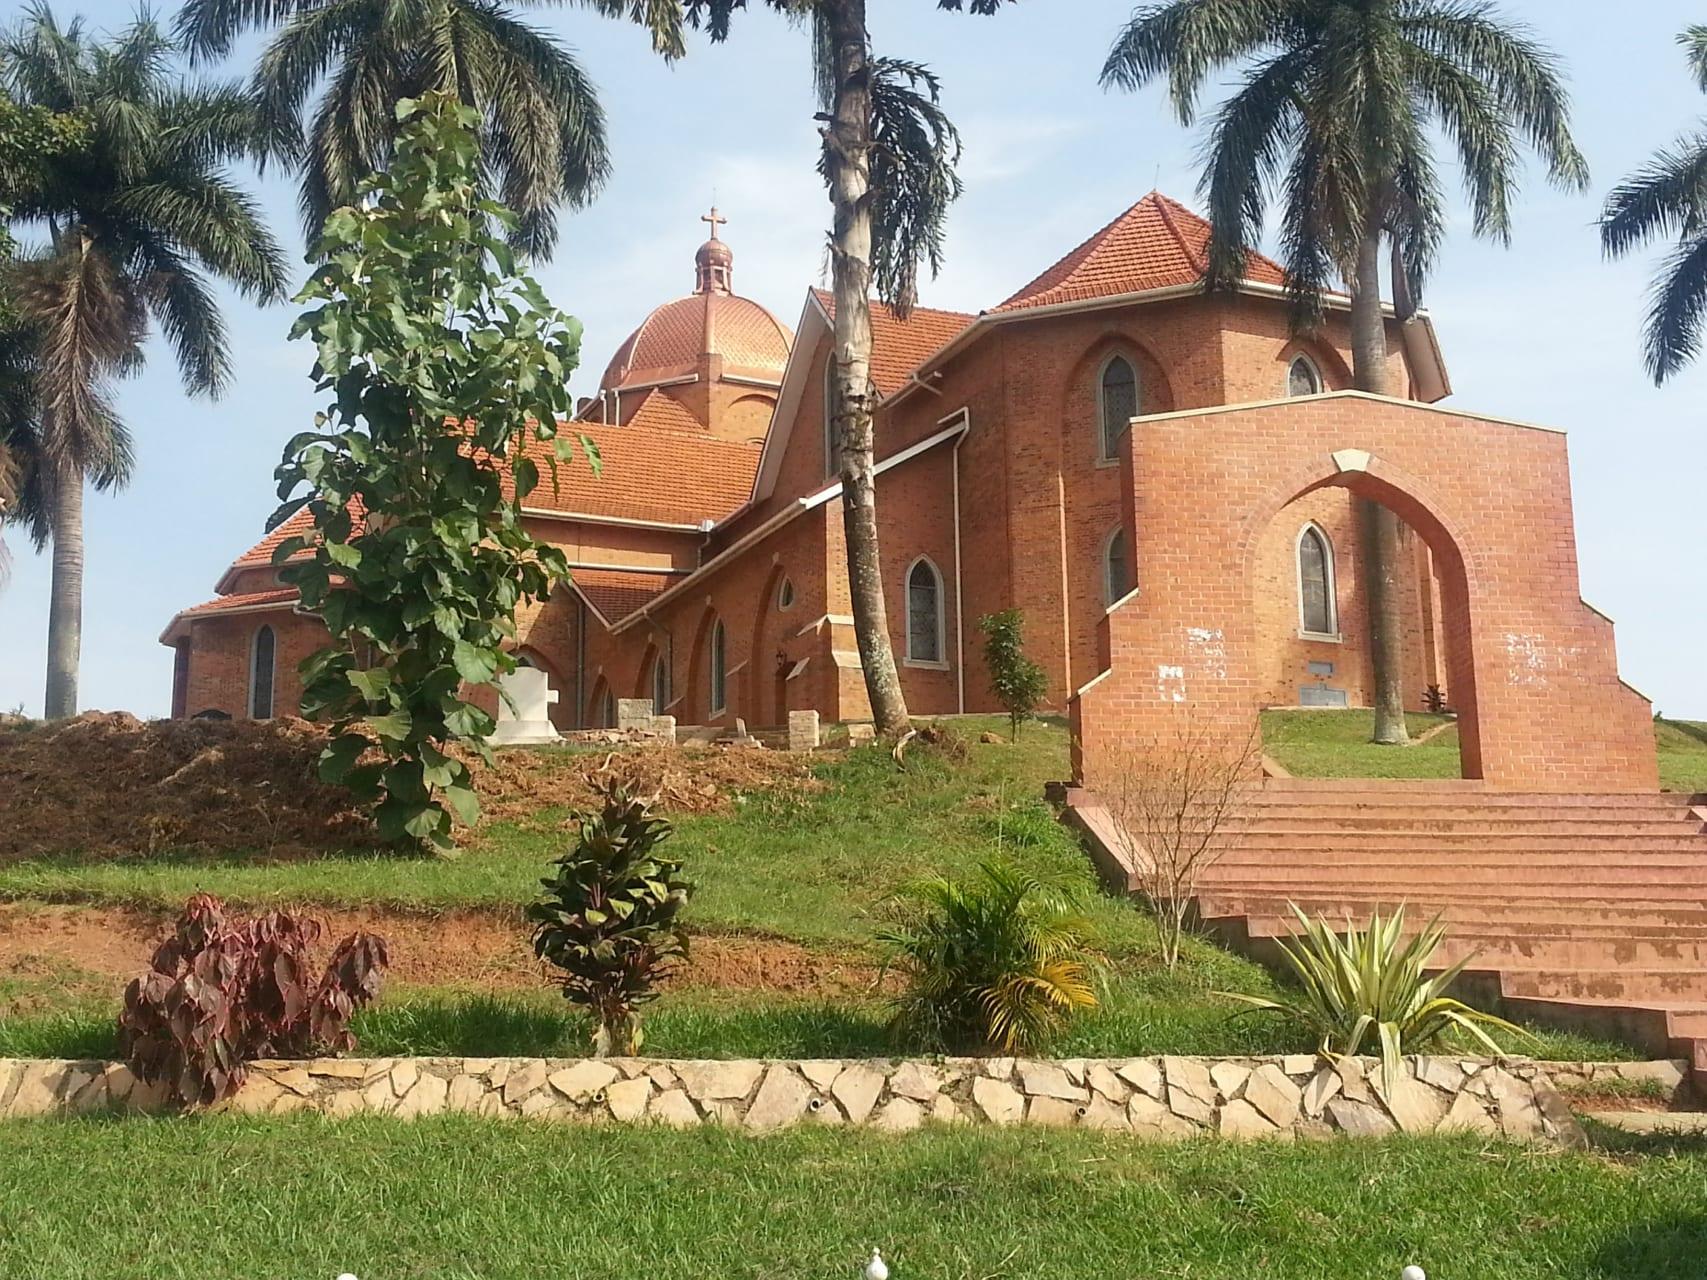 Kampala - Namirembe Cathedral Church - The Oldest Anglican Church in Uganda